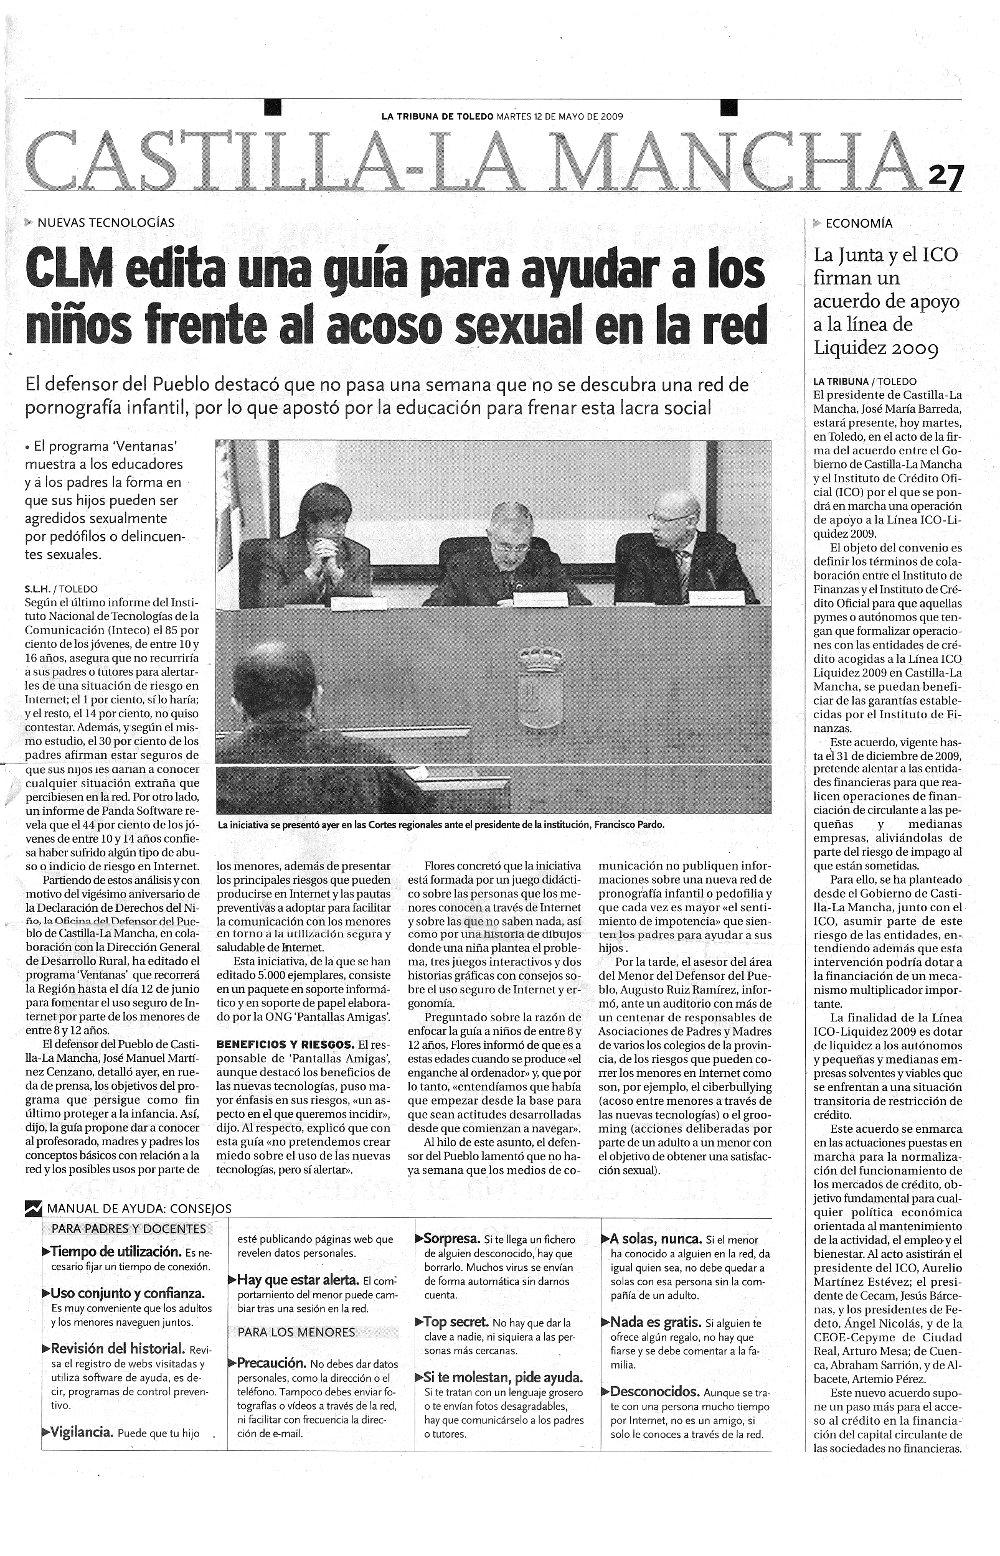 20090512-la-tribuna-de-toledo-recorte